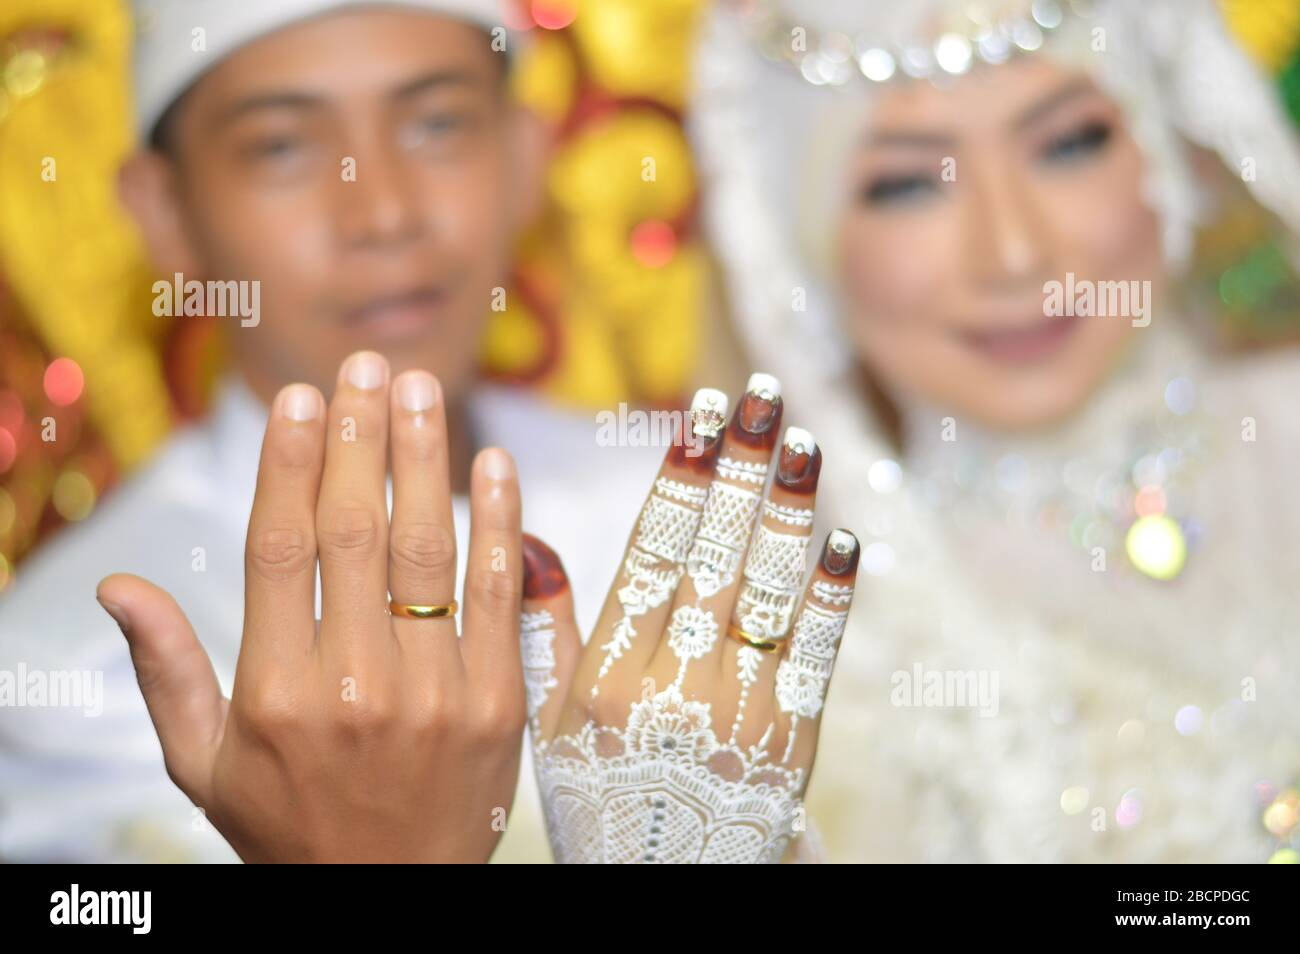 Tarakan Indonesia 6 December 2018 Indonesian Brides In White Kebaya Show Awin Rings On Their Fingers Stock Photo Alamy